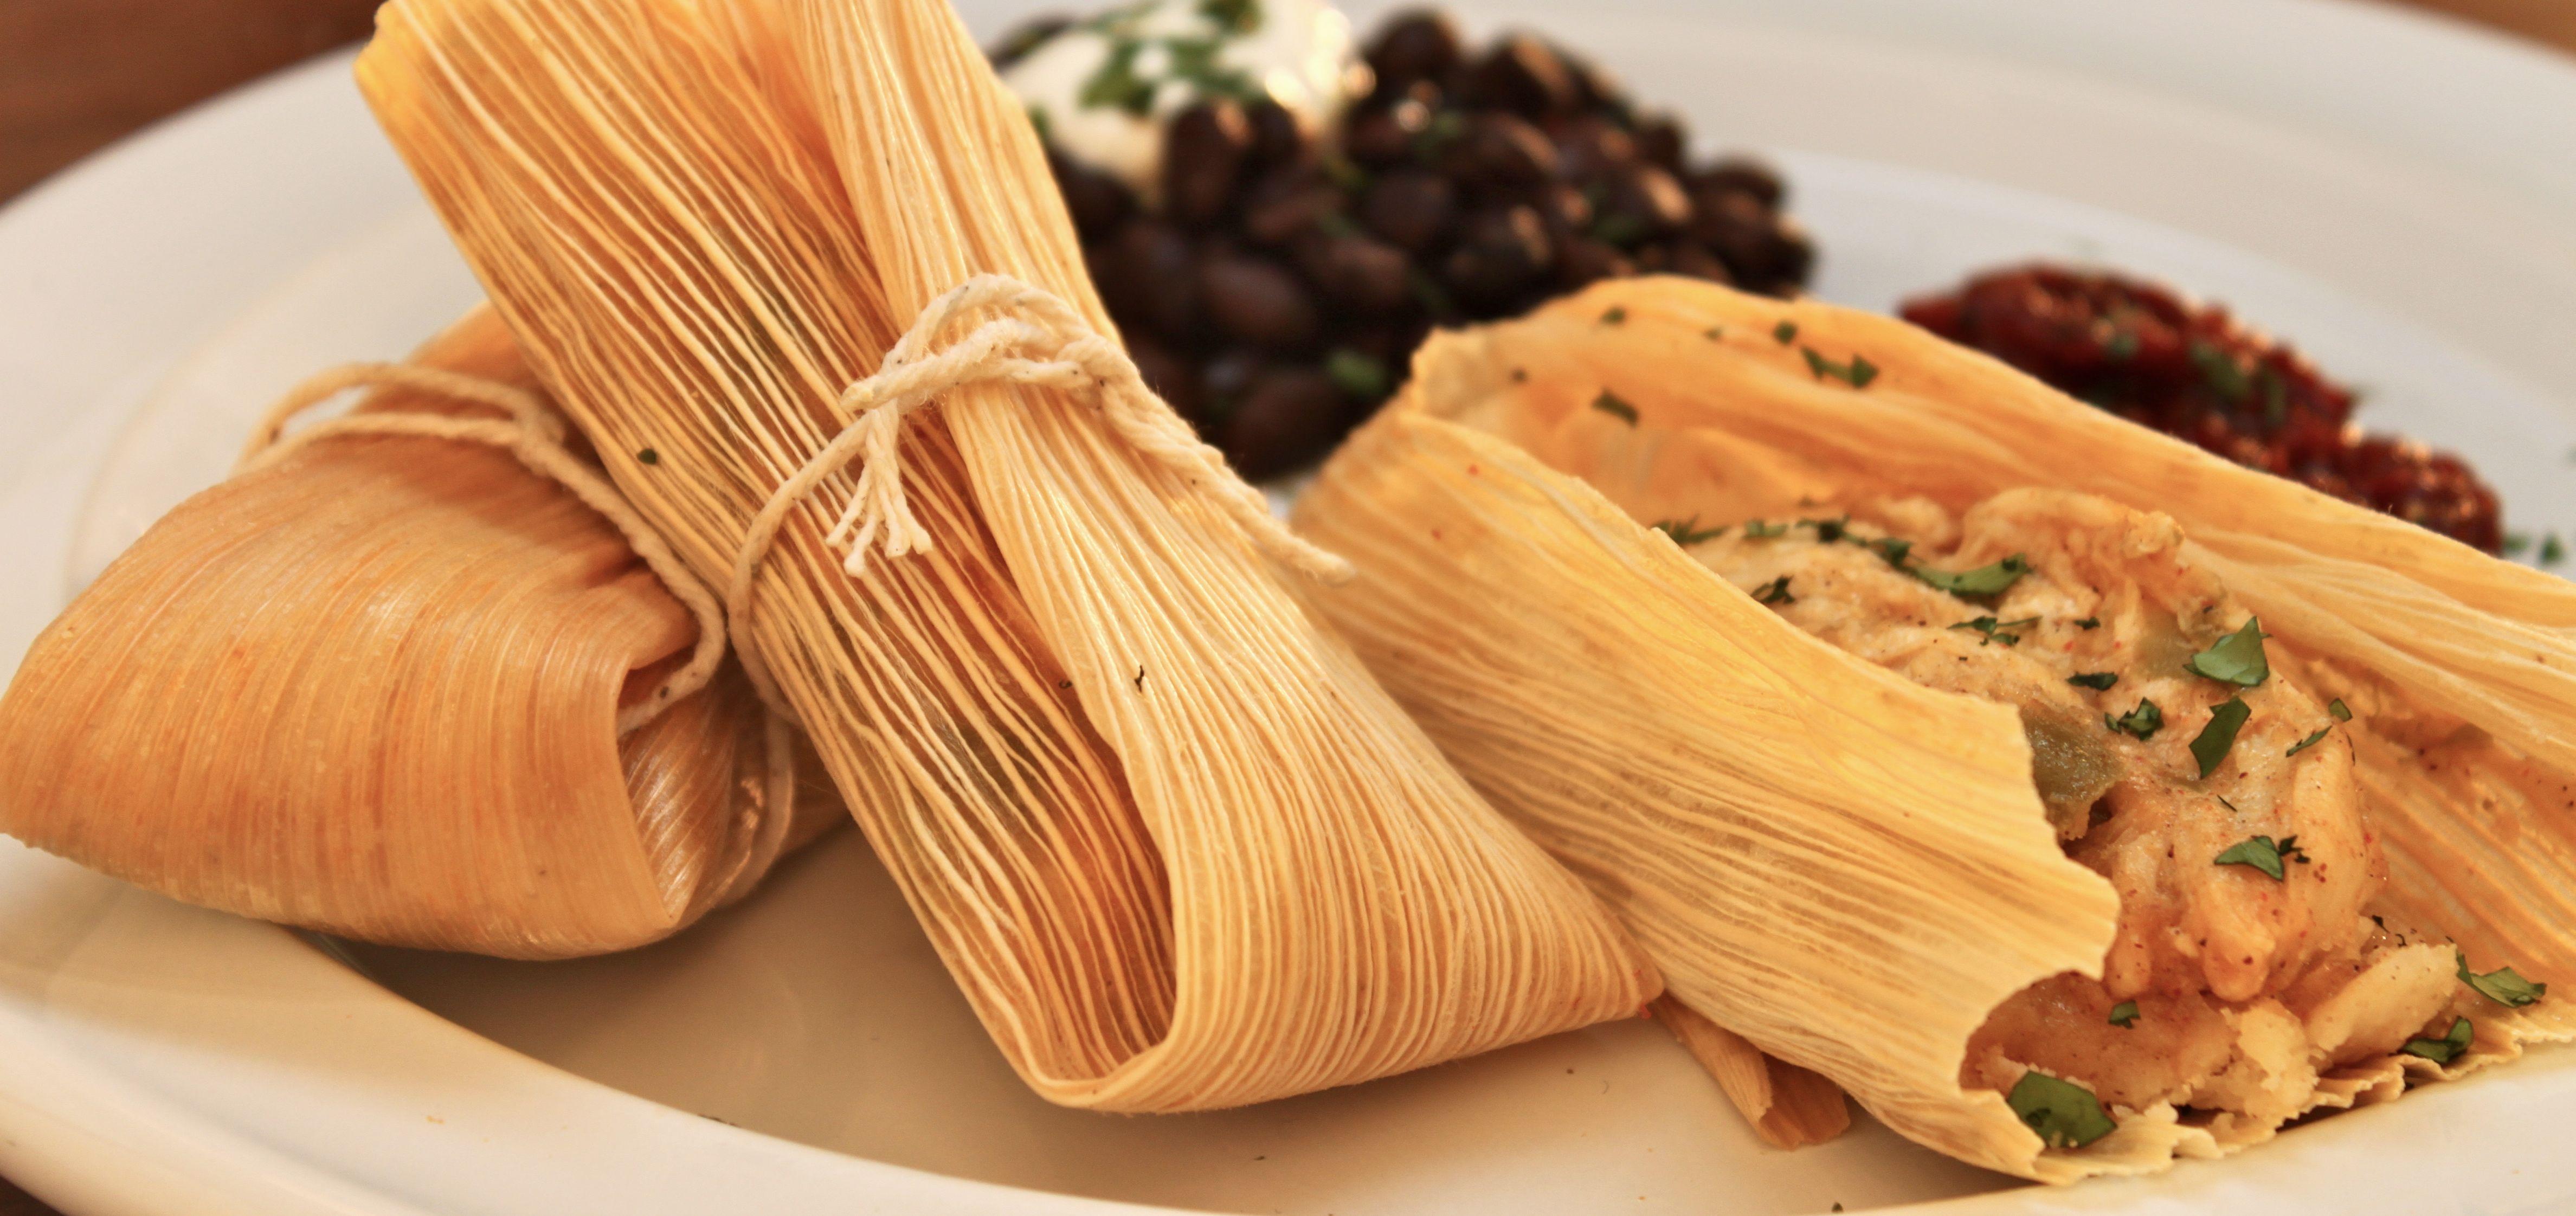 Tamales : Article - GourmetSleuth